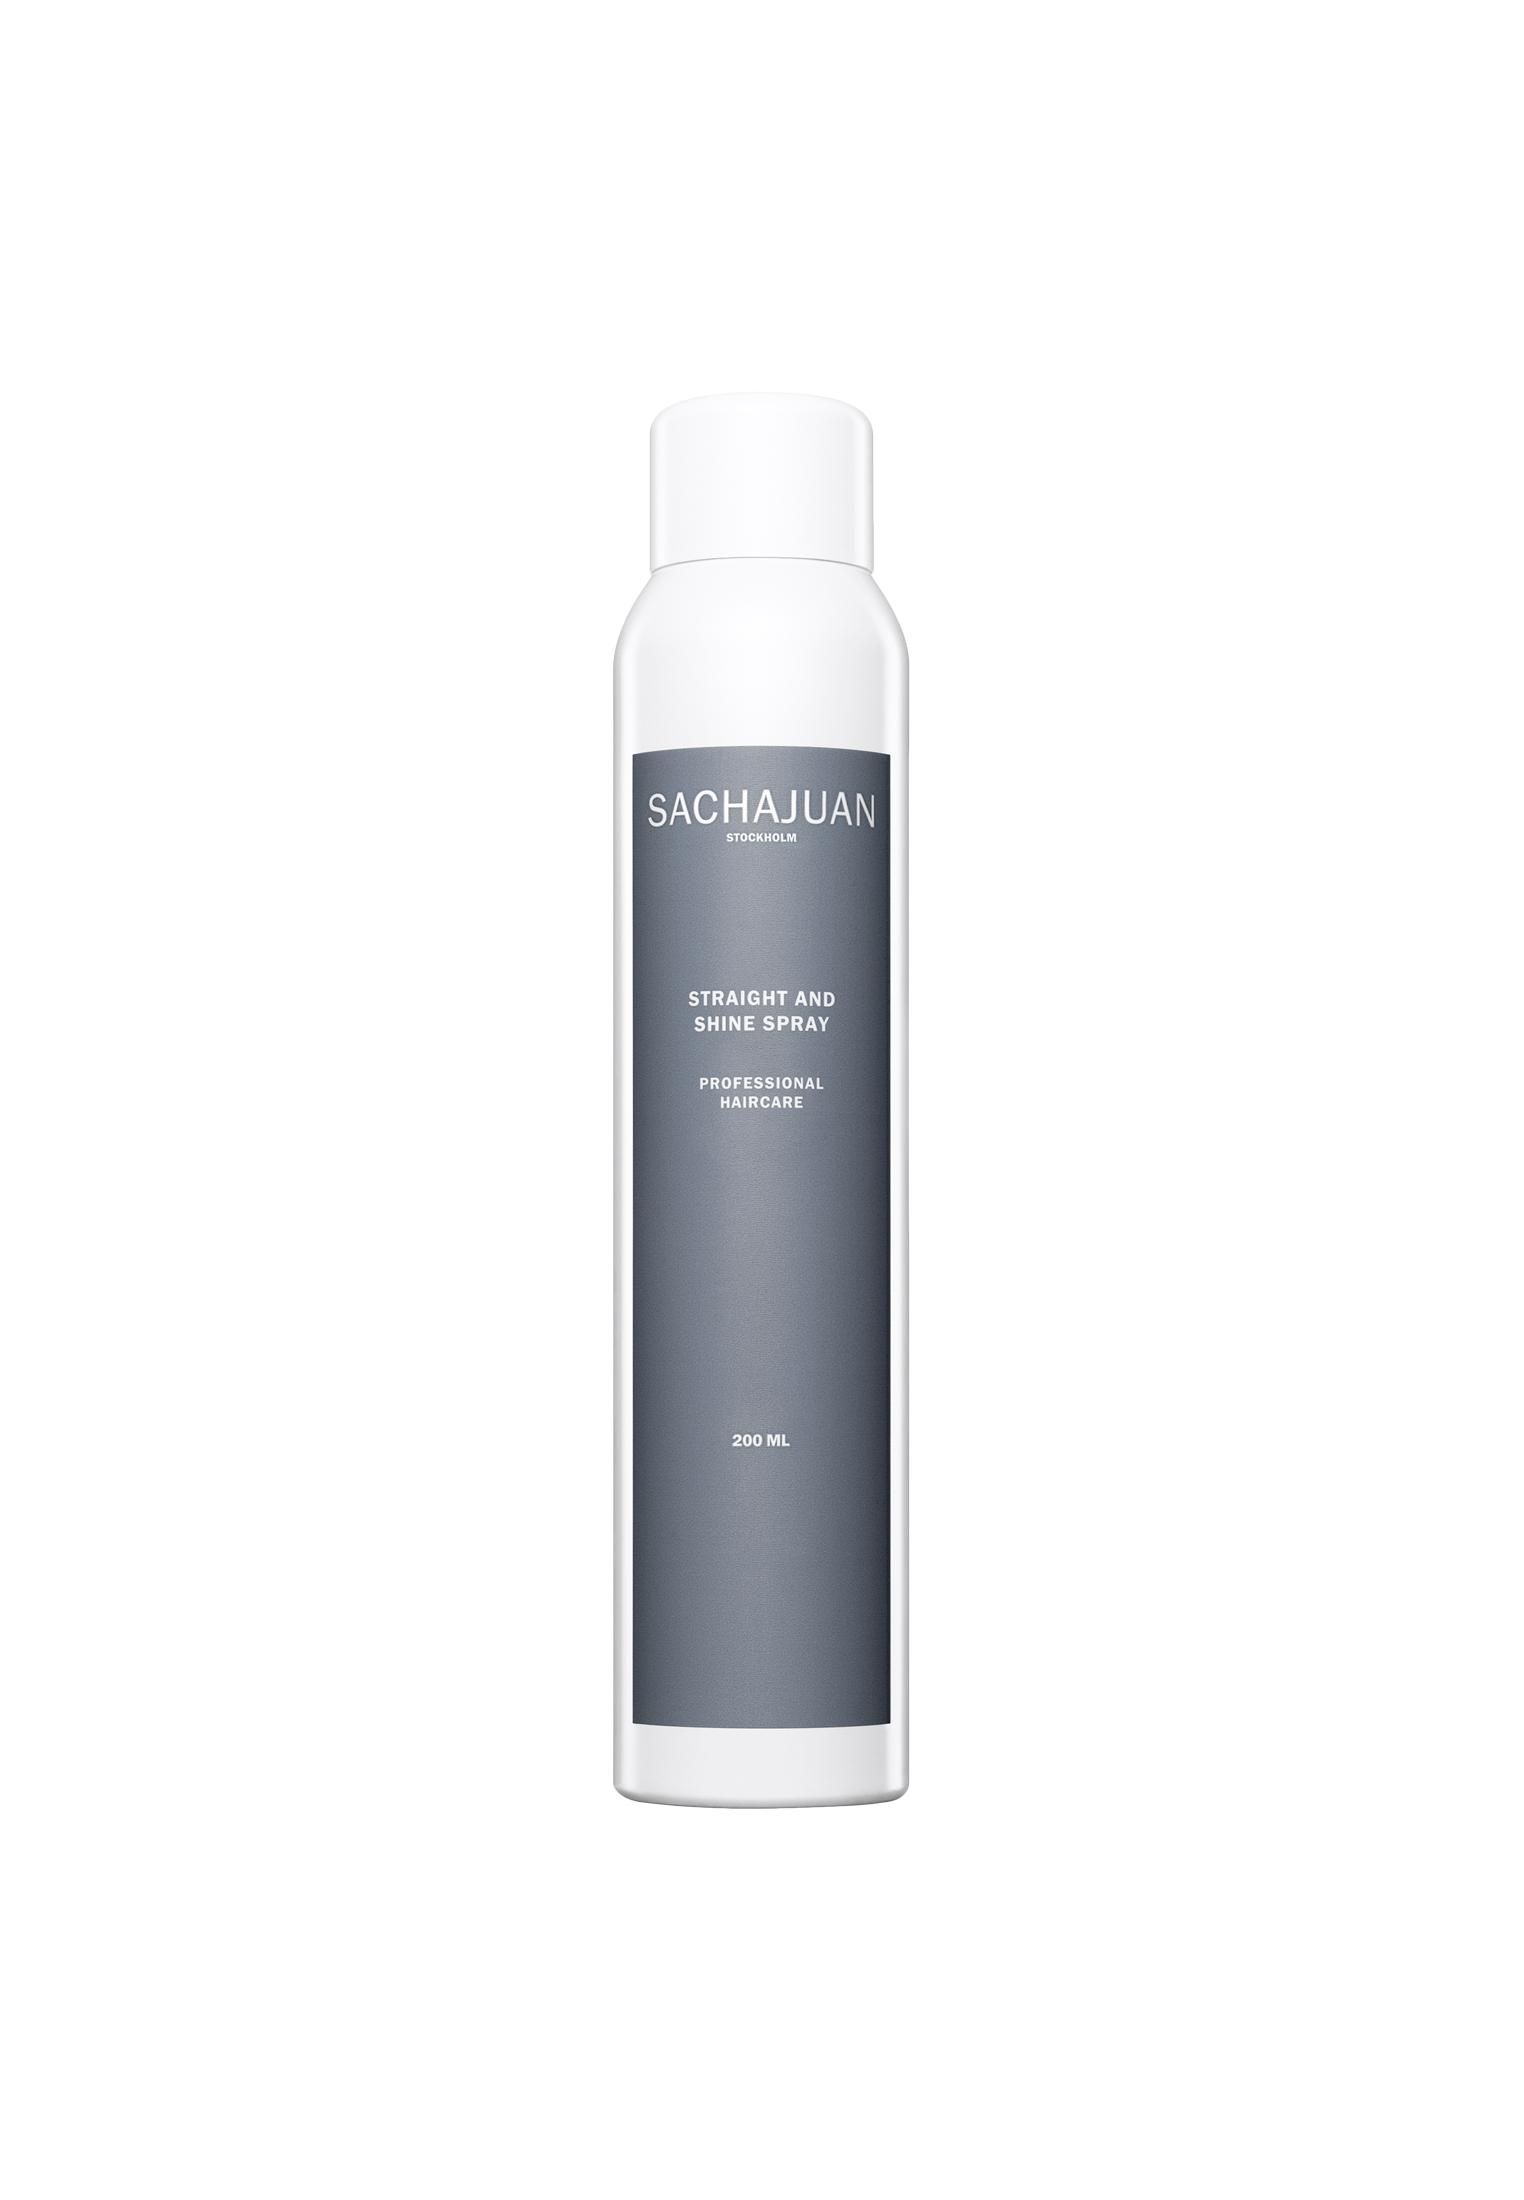 SACHAJUAN - Straight and Shine Spray - 200 ml